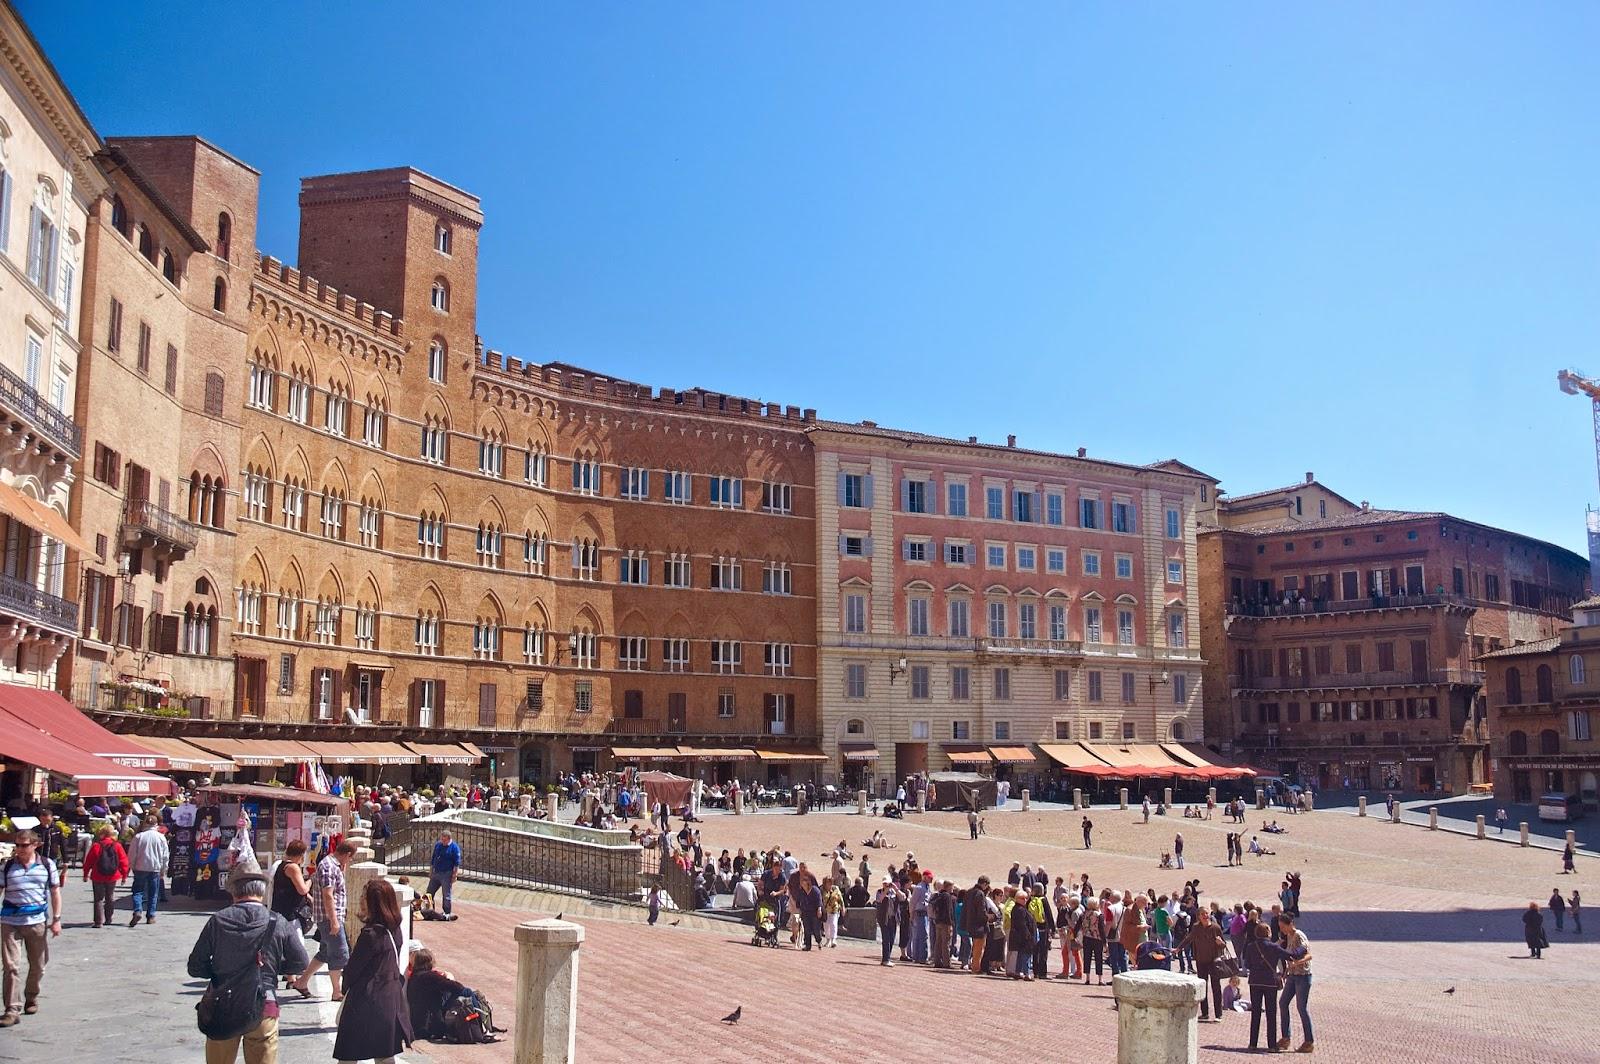 centrum miasta Siena